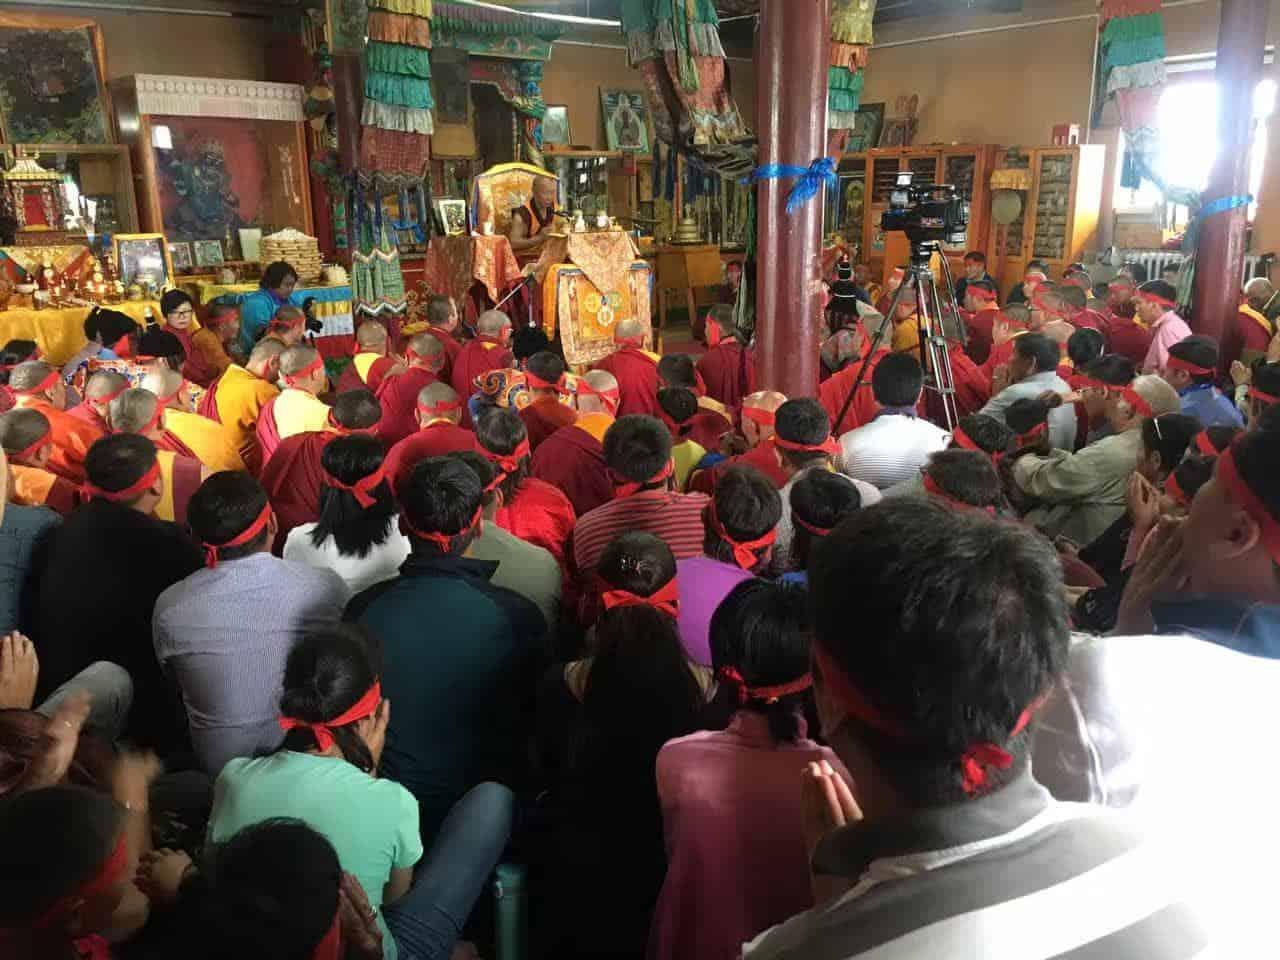 gosok-rinpoche-mongolia-2016-43719a70fbc4e9832038ff8eca328aa